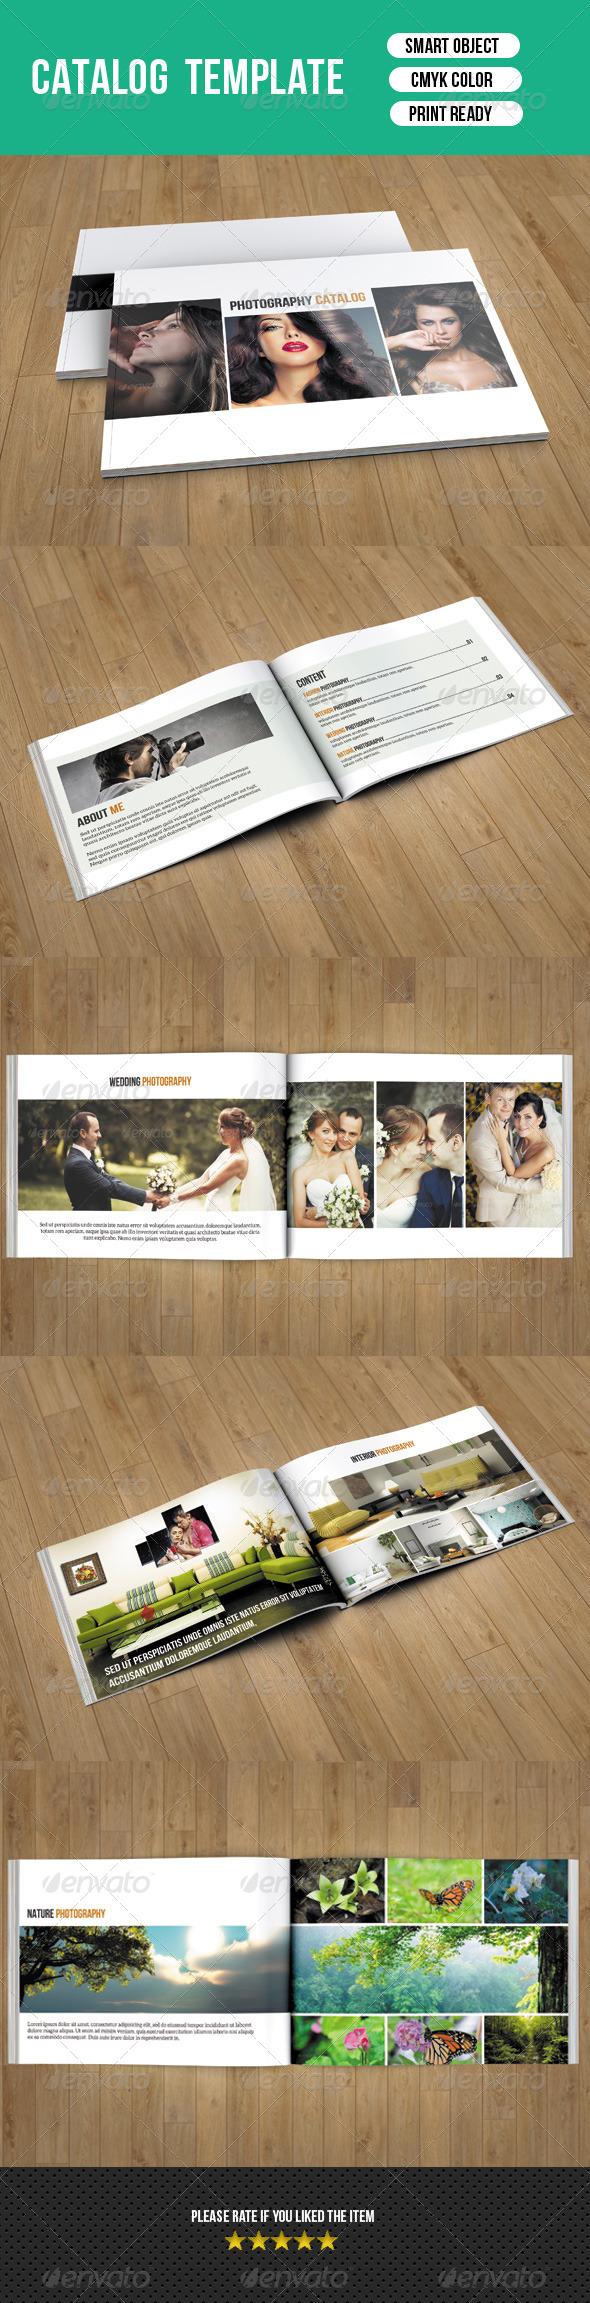 GraphicRiver Photography Catalog 8409237